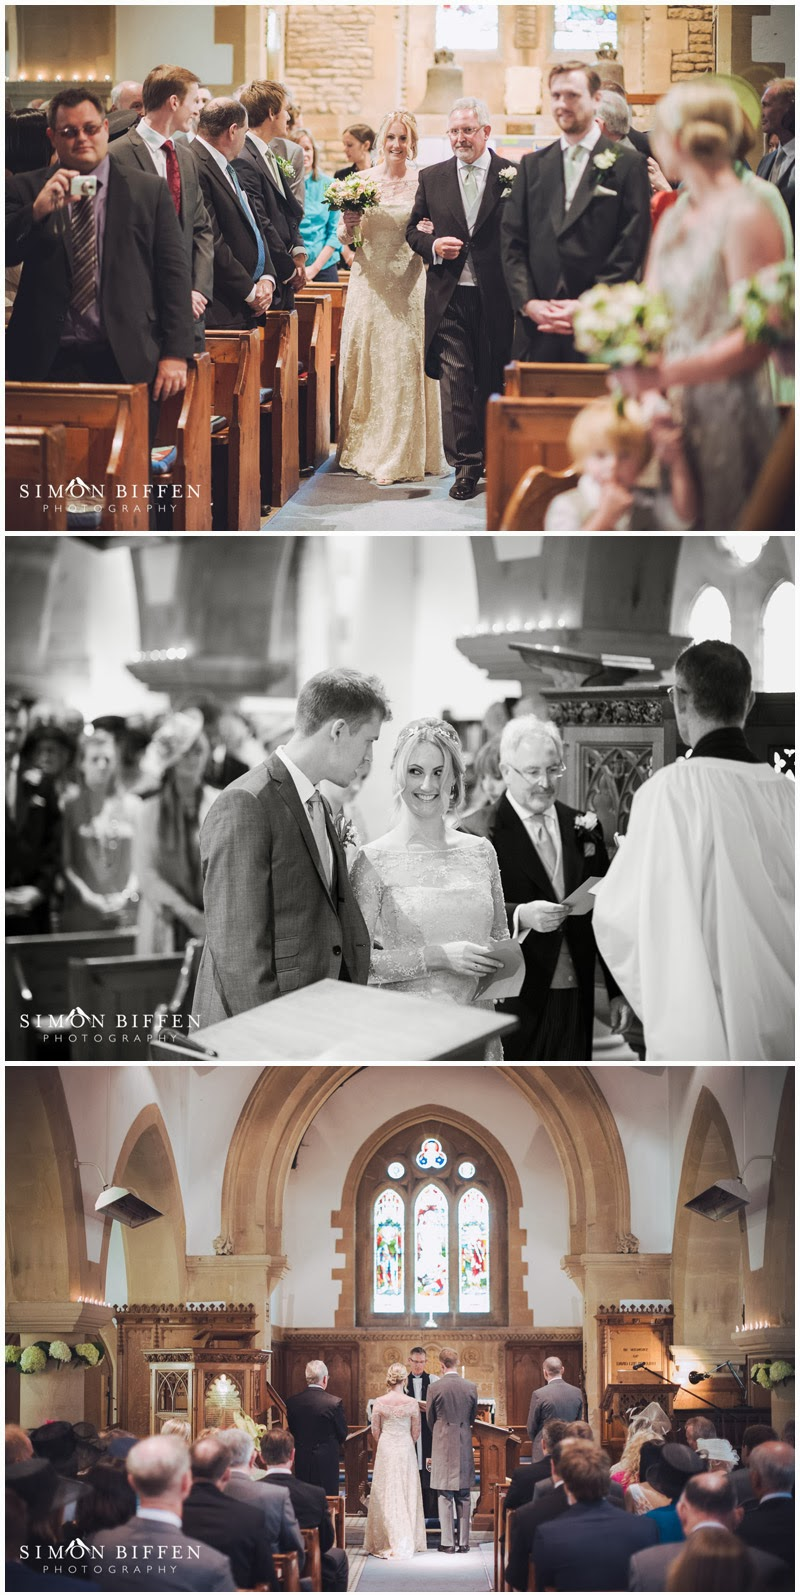 Arrival of the bride at Monkton Combe church